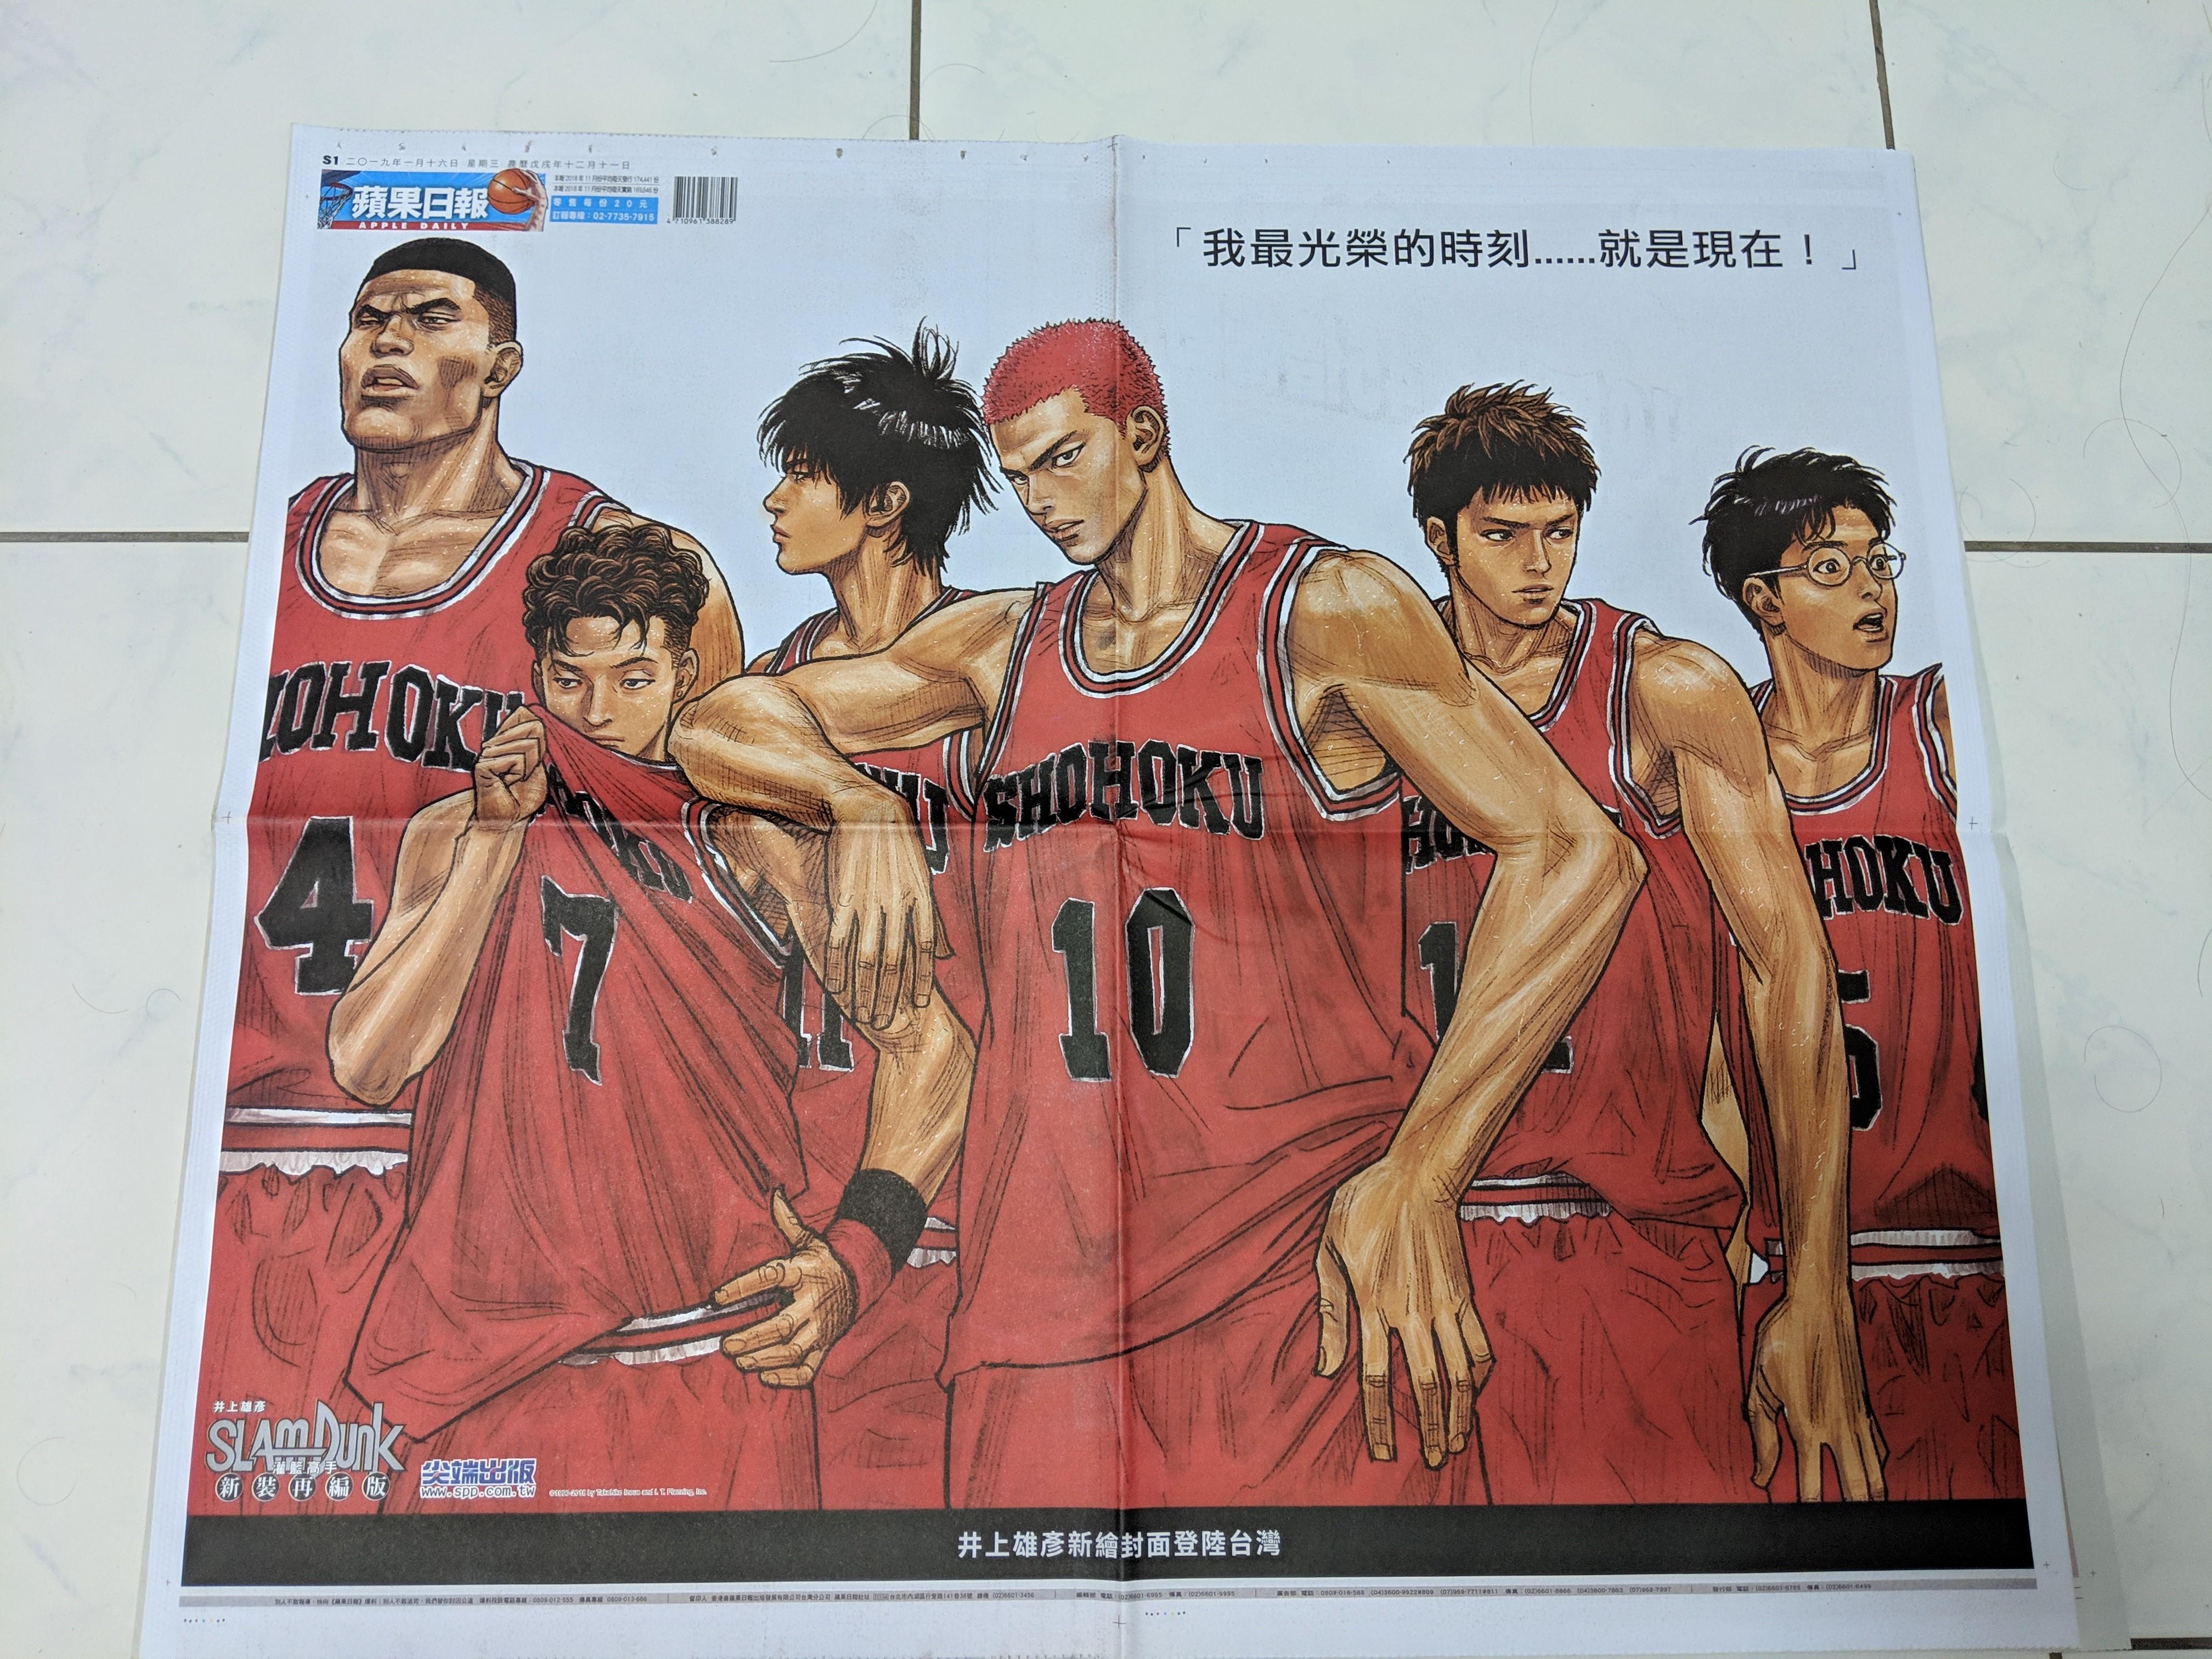 Basketball, Art, Poster, poster, sports, poster, team sport, ball game, art, advertising, basketball